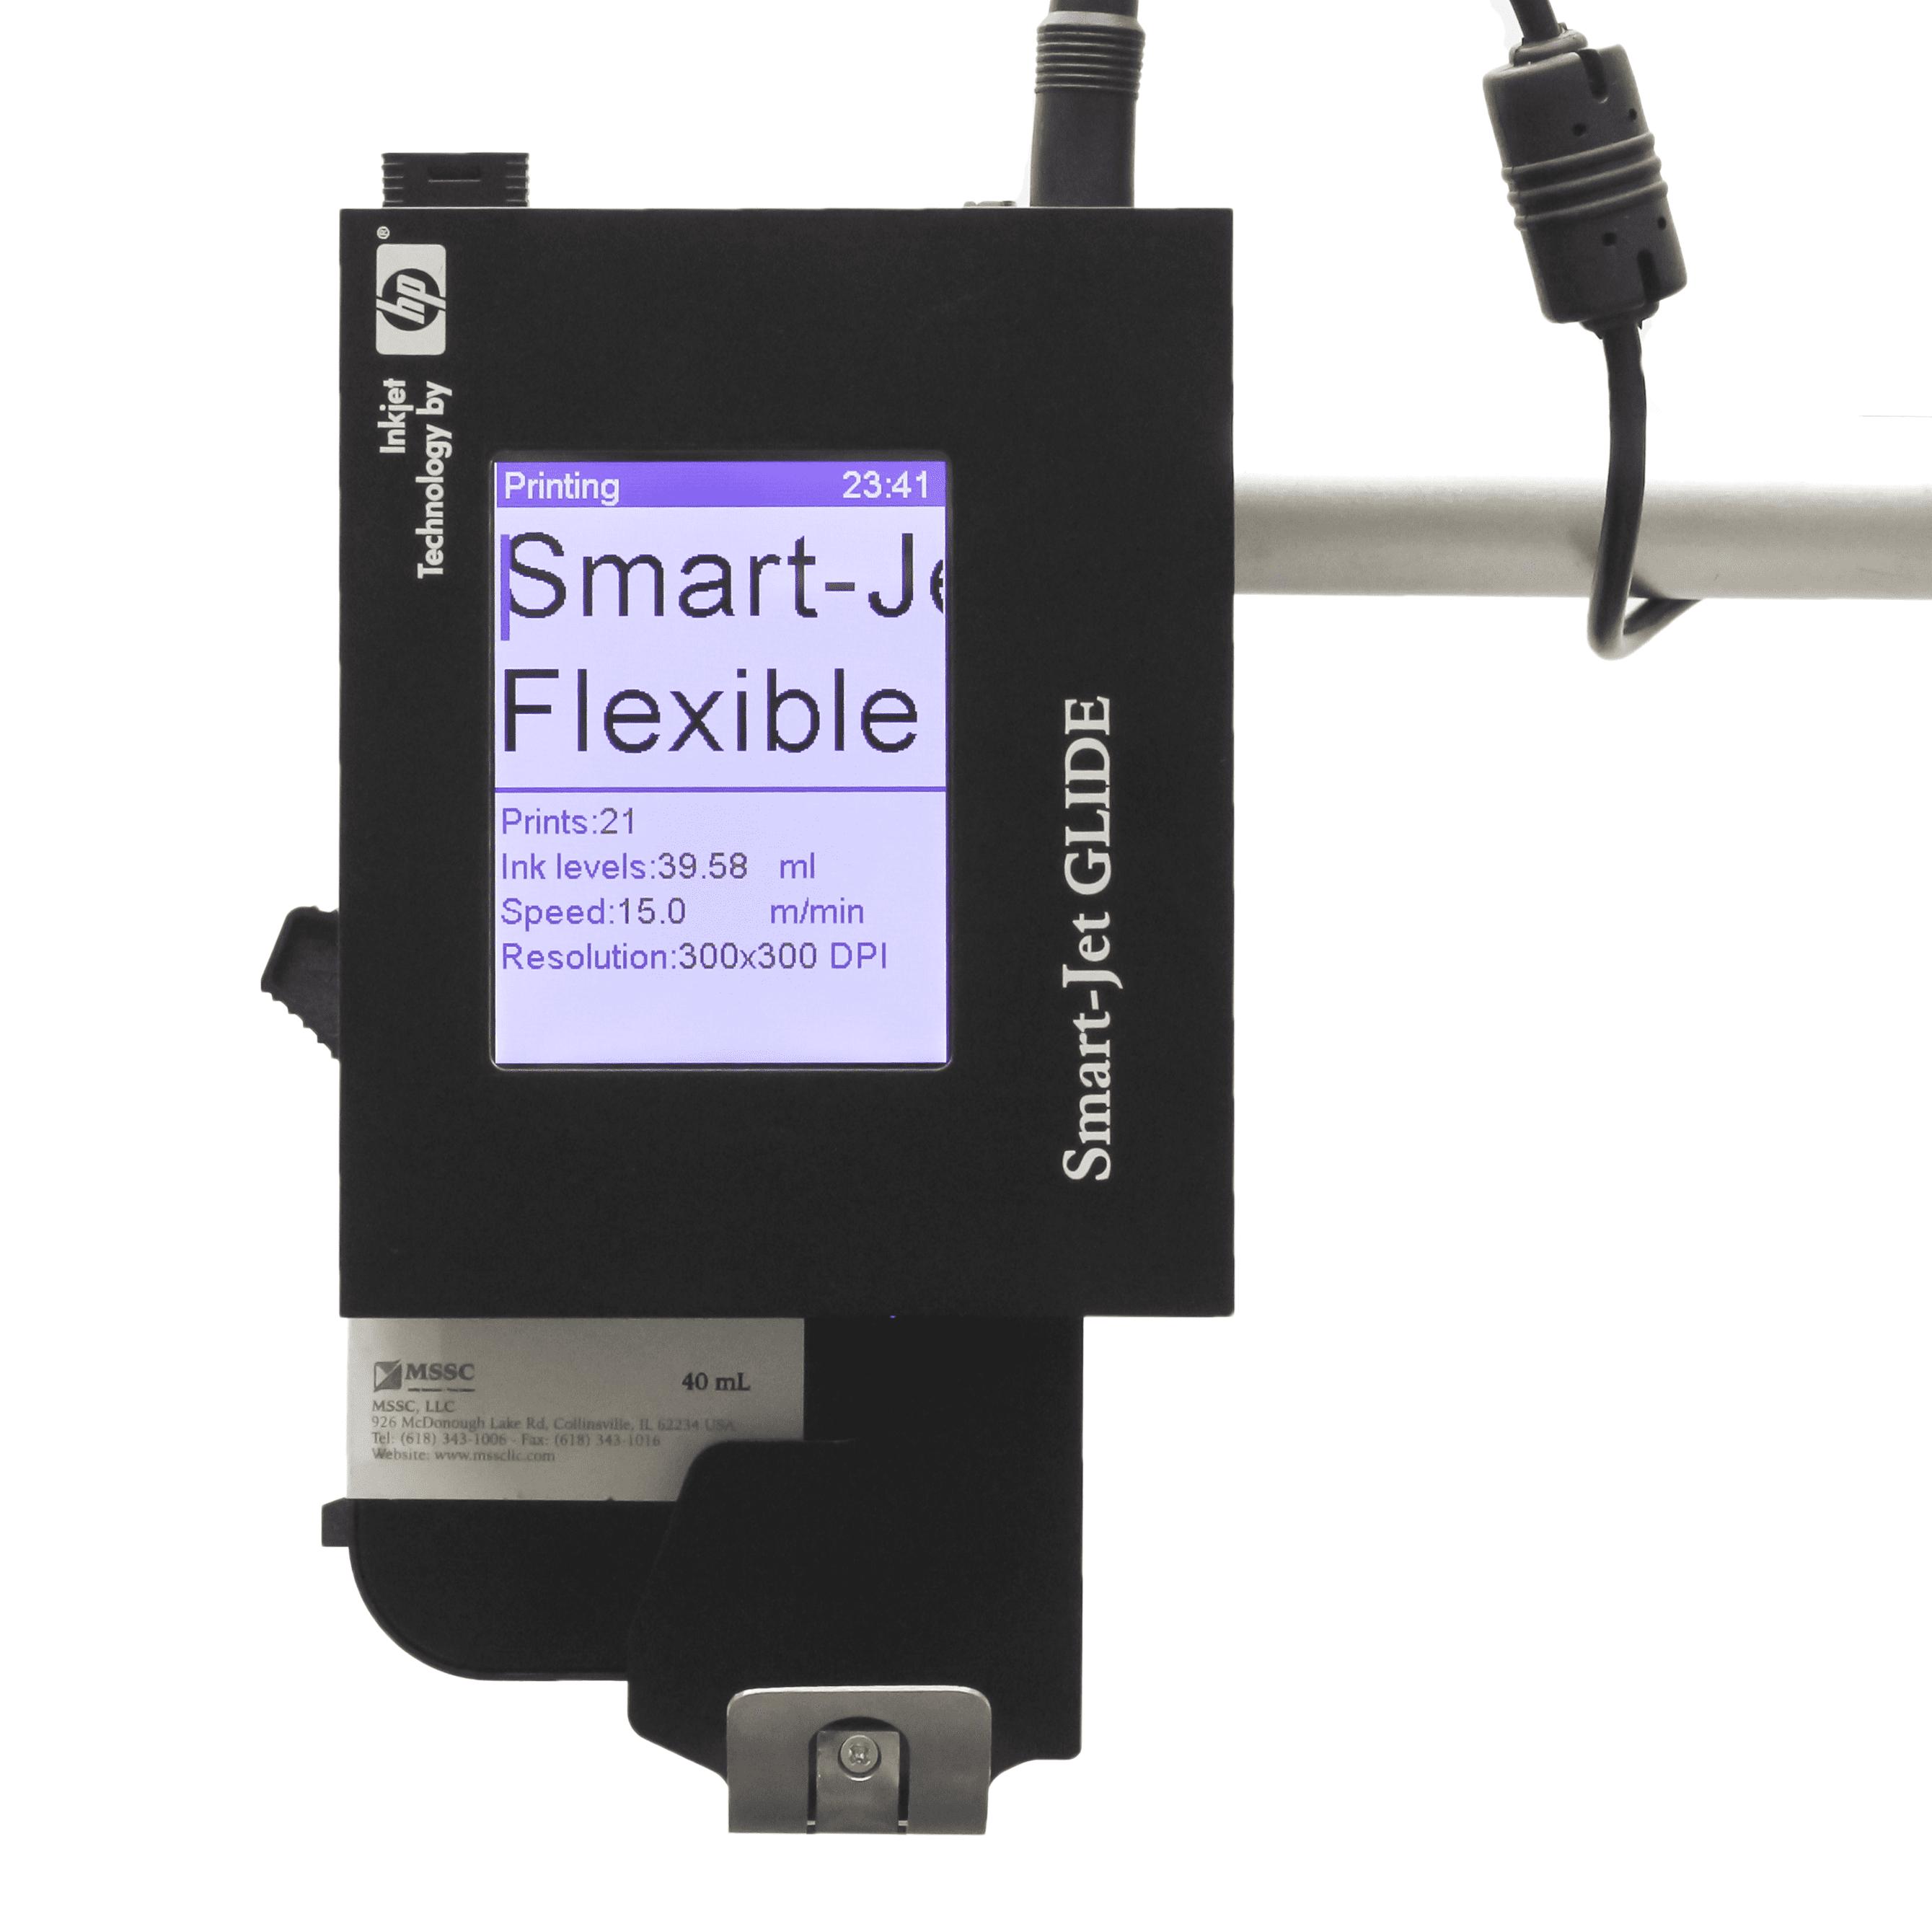 Smart Jet Glide Printer - MSSC LLC